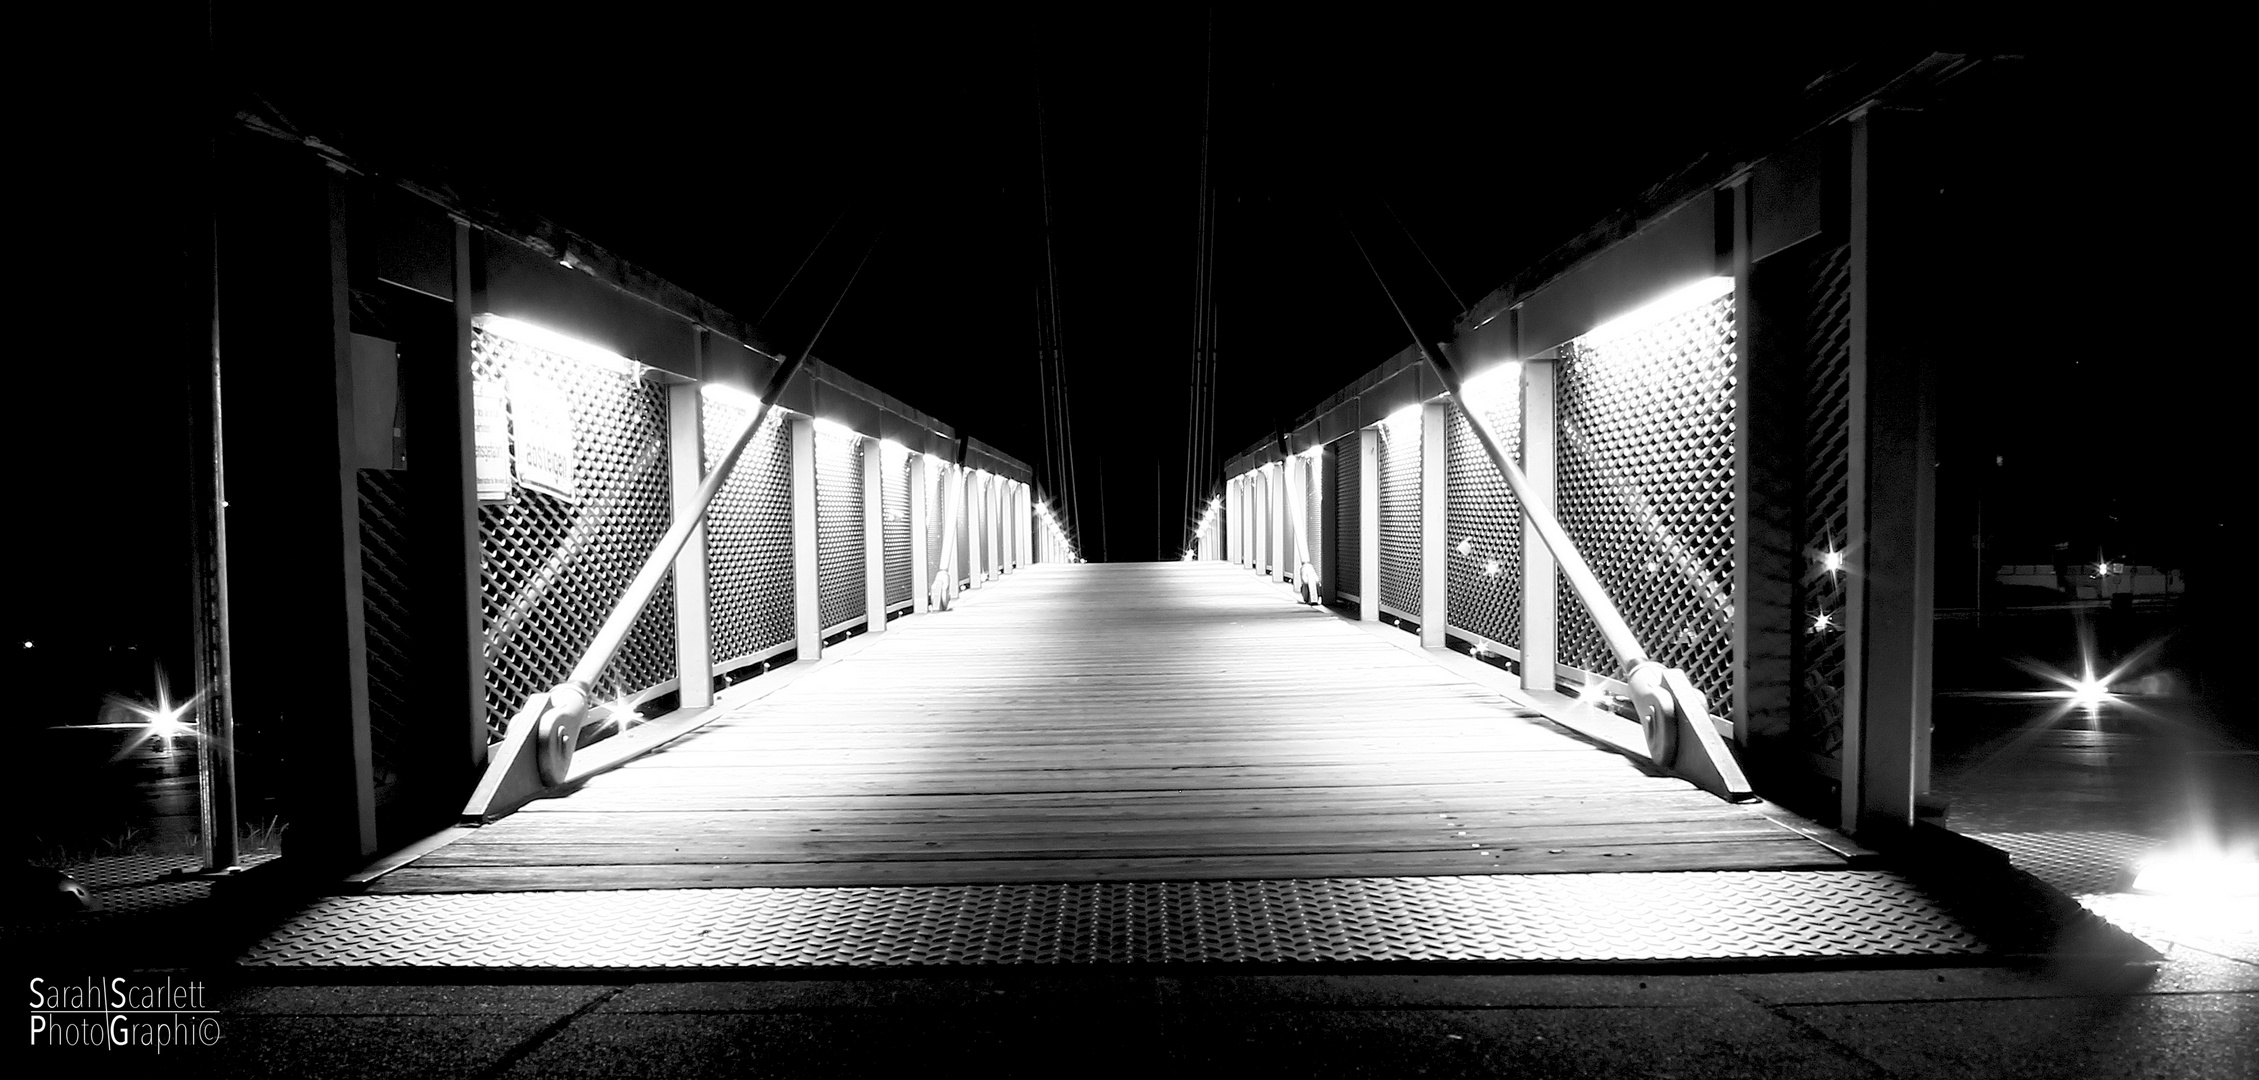 Brücke bei Nacht 2.0